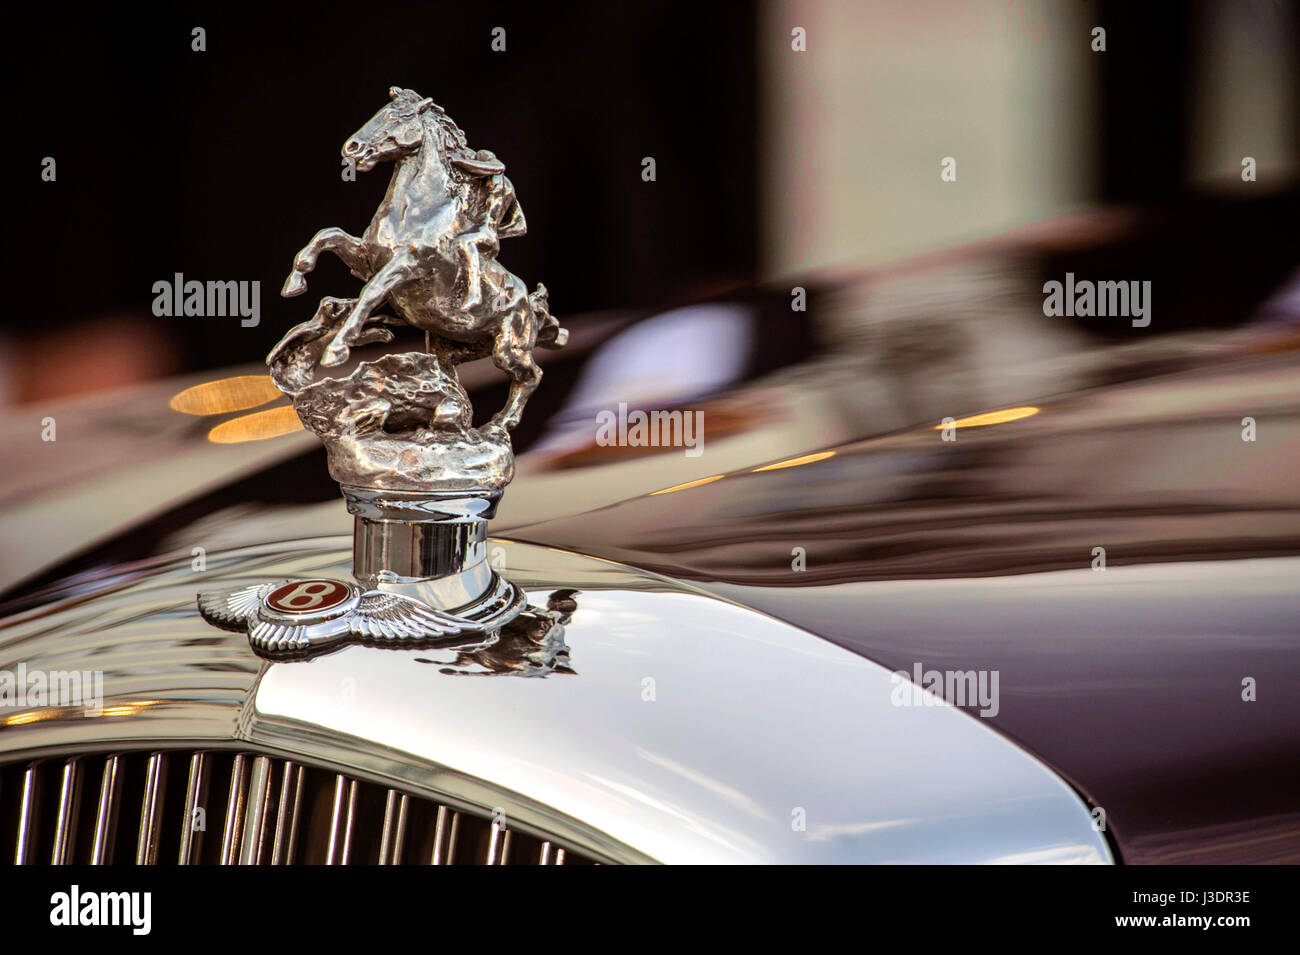 royal snail  britain england queen Elizabeth car hood ornament